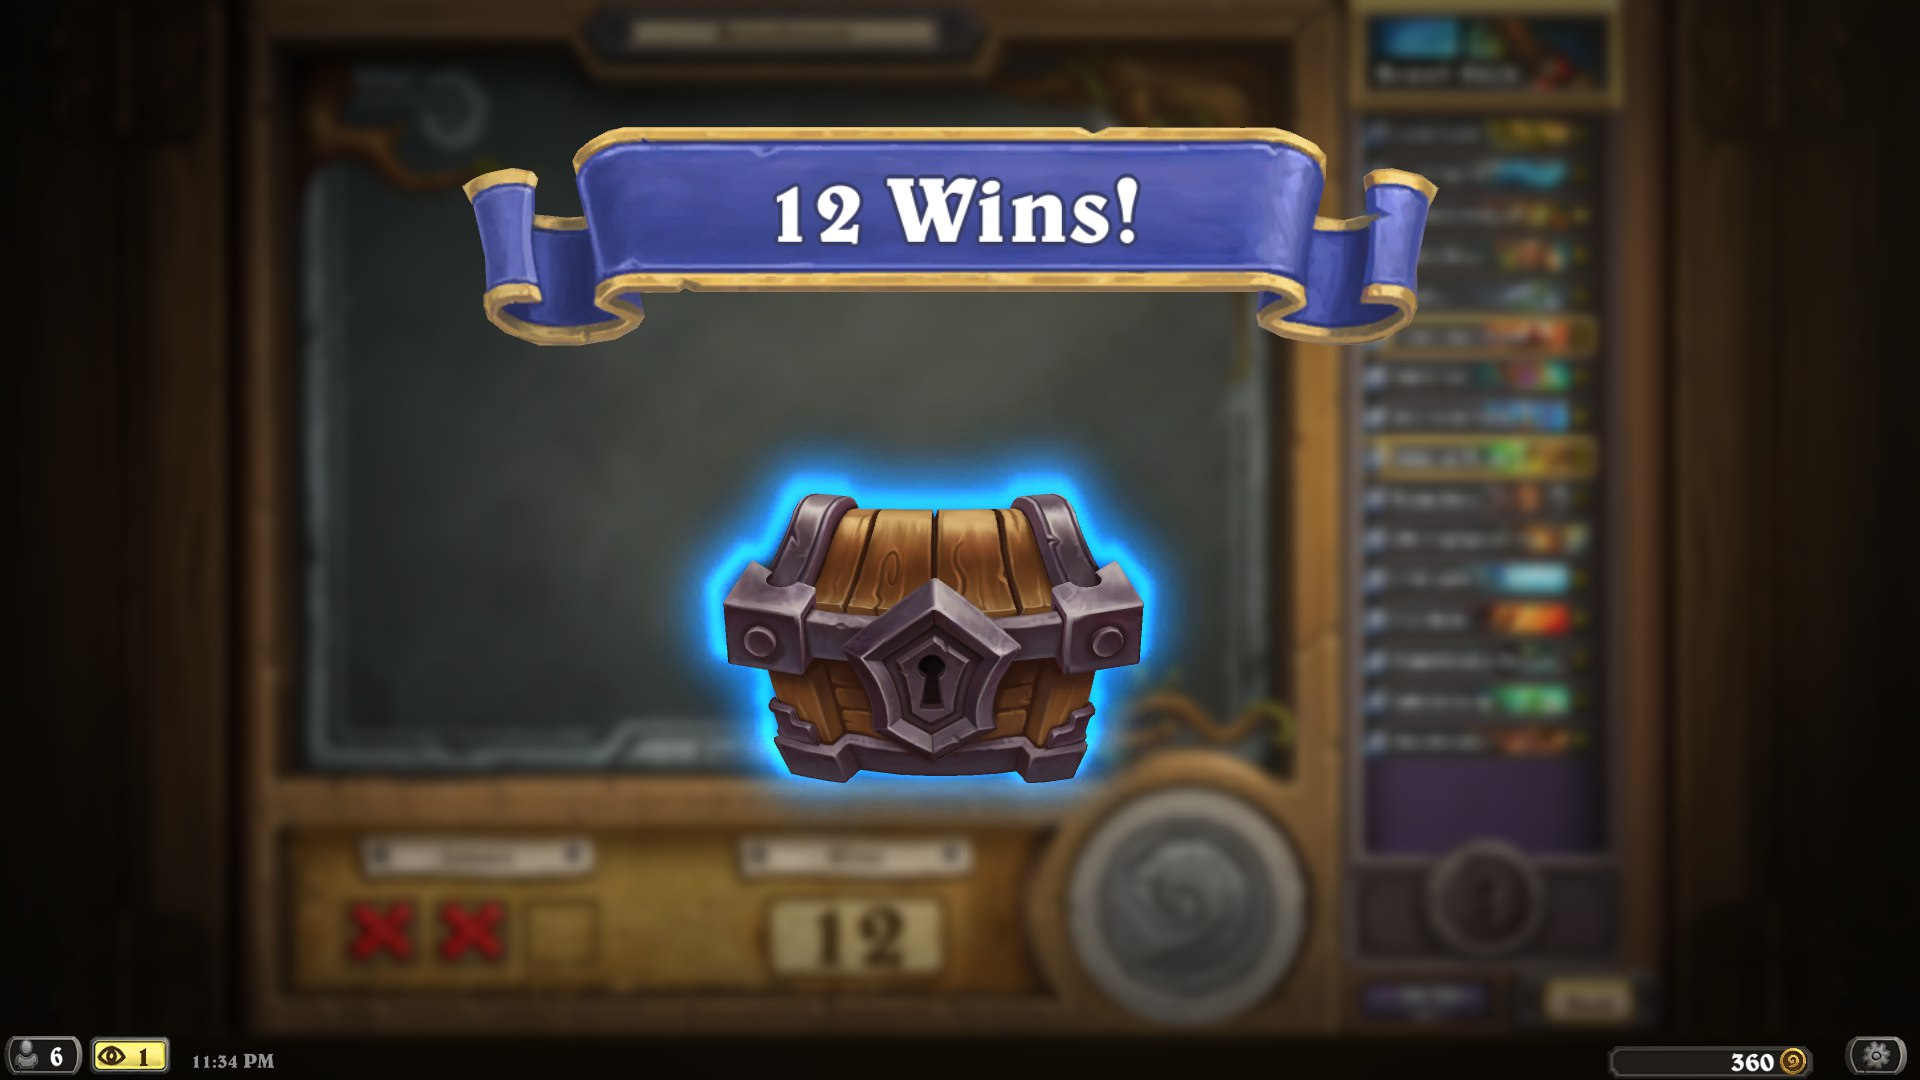 12 wins